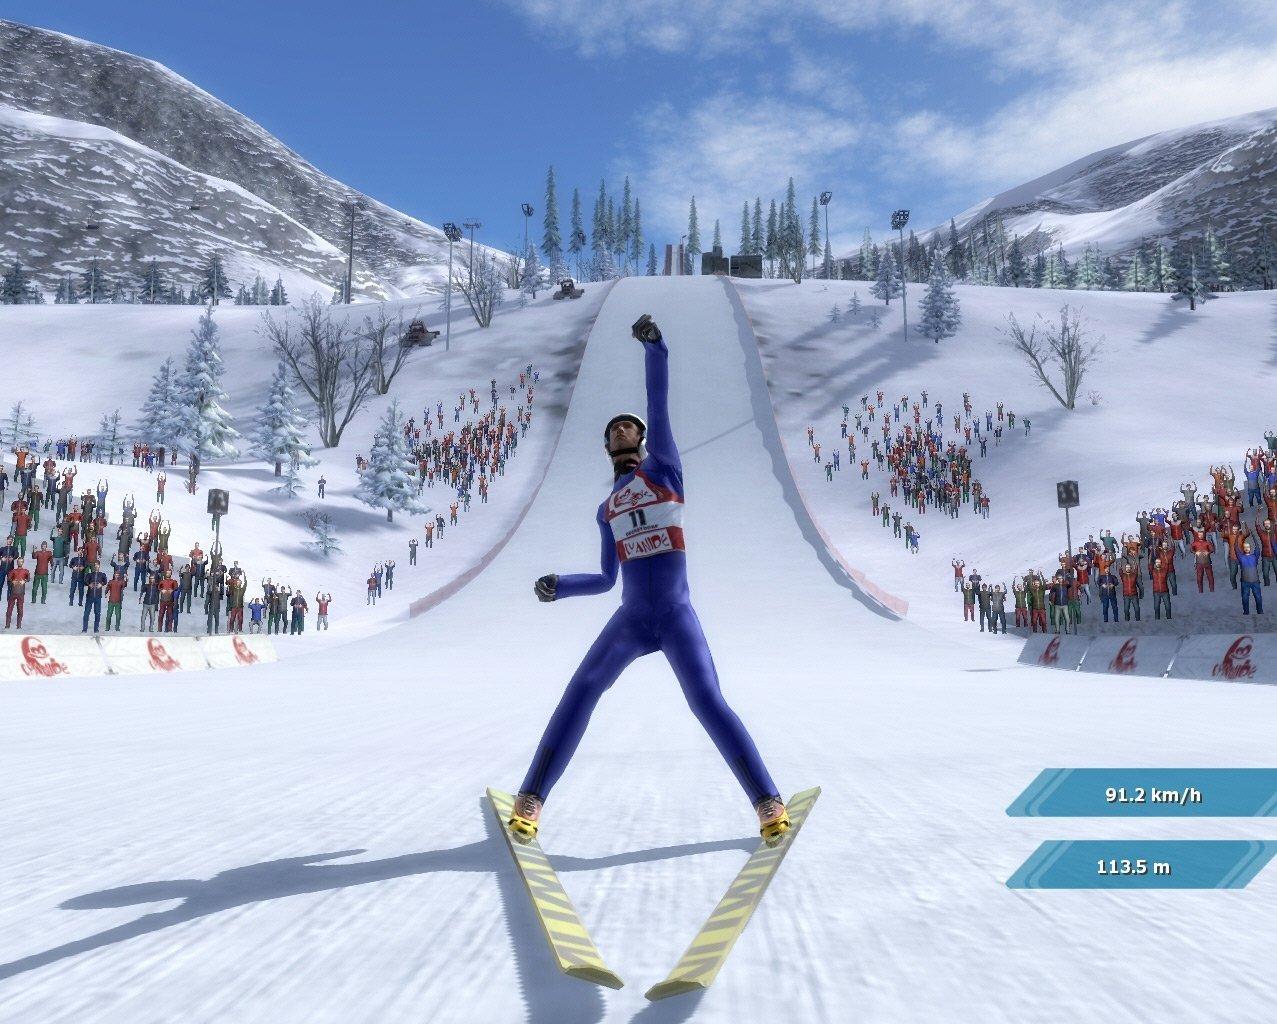 Winter challenge / wintersport pro 2006 / зимние олимпийские игры.